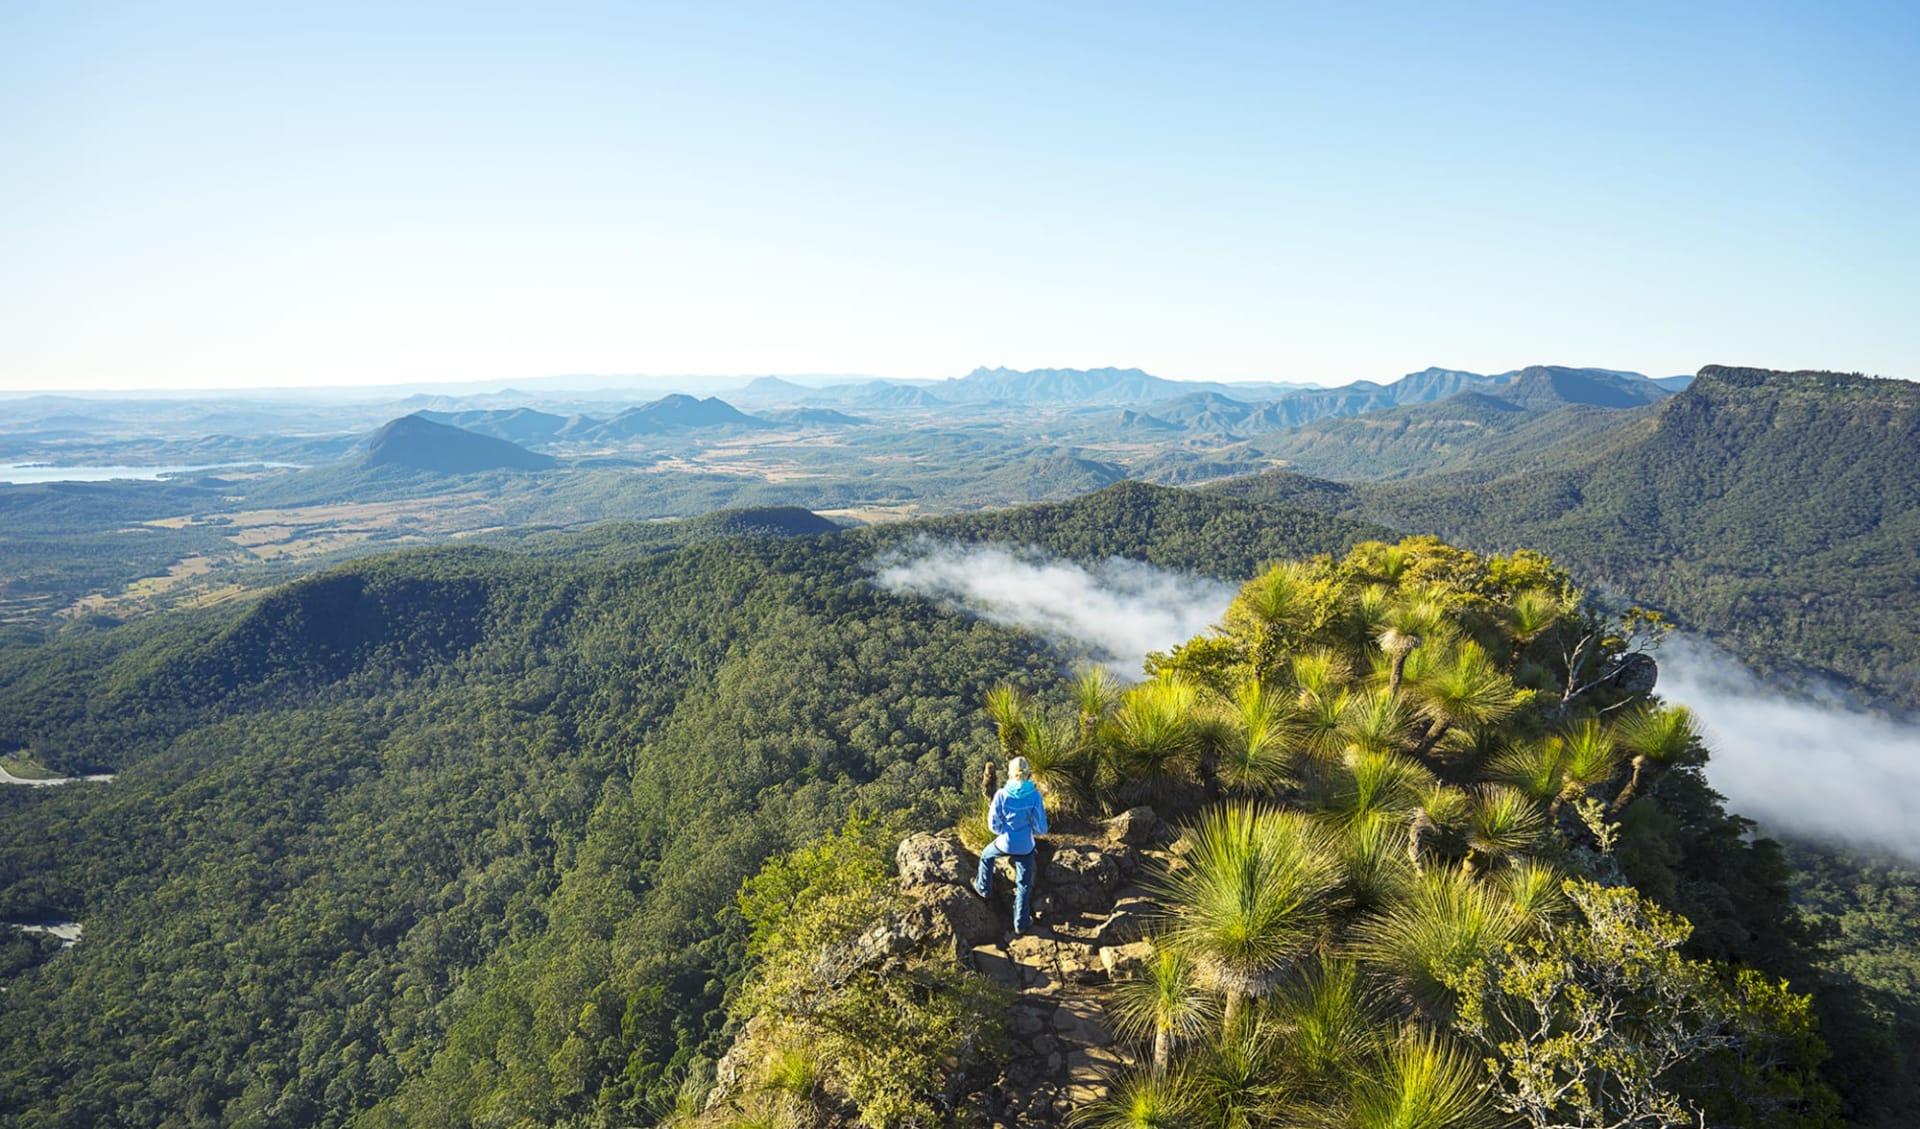 Scenic Rim Trail ab Brisbane: Australia - Queensland - Scenic Rim Trail - Bergpanorama